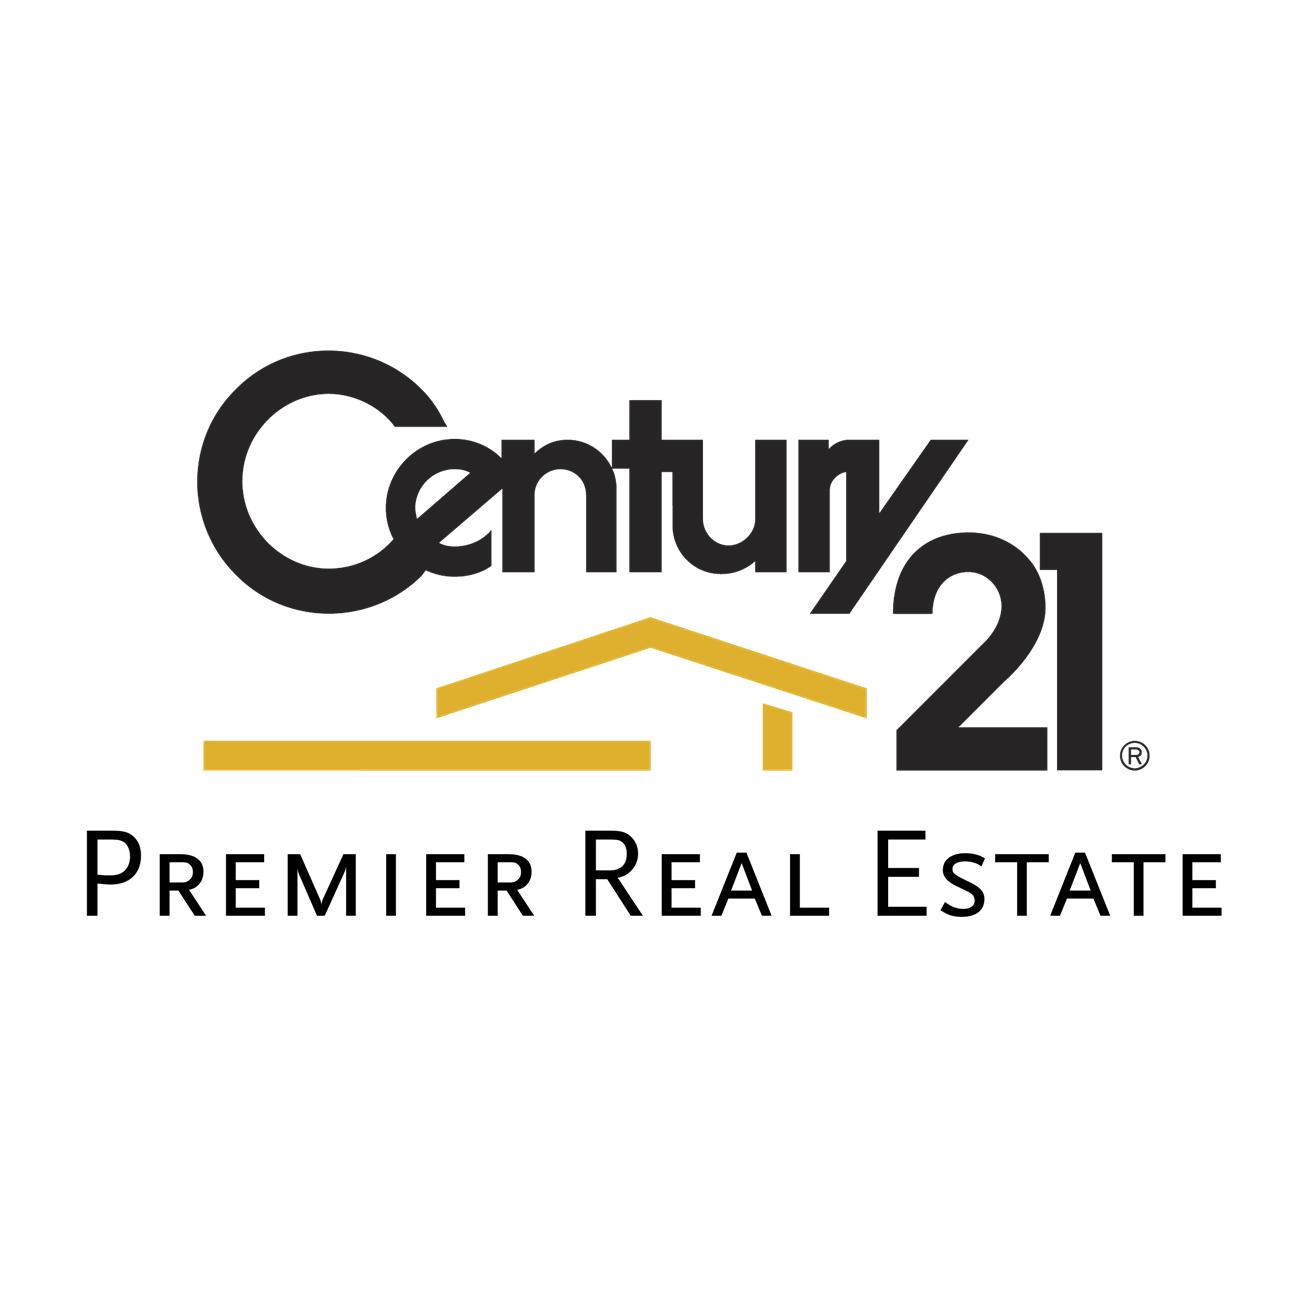 Century 21 Premier Real Estate